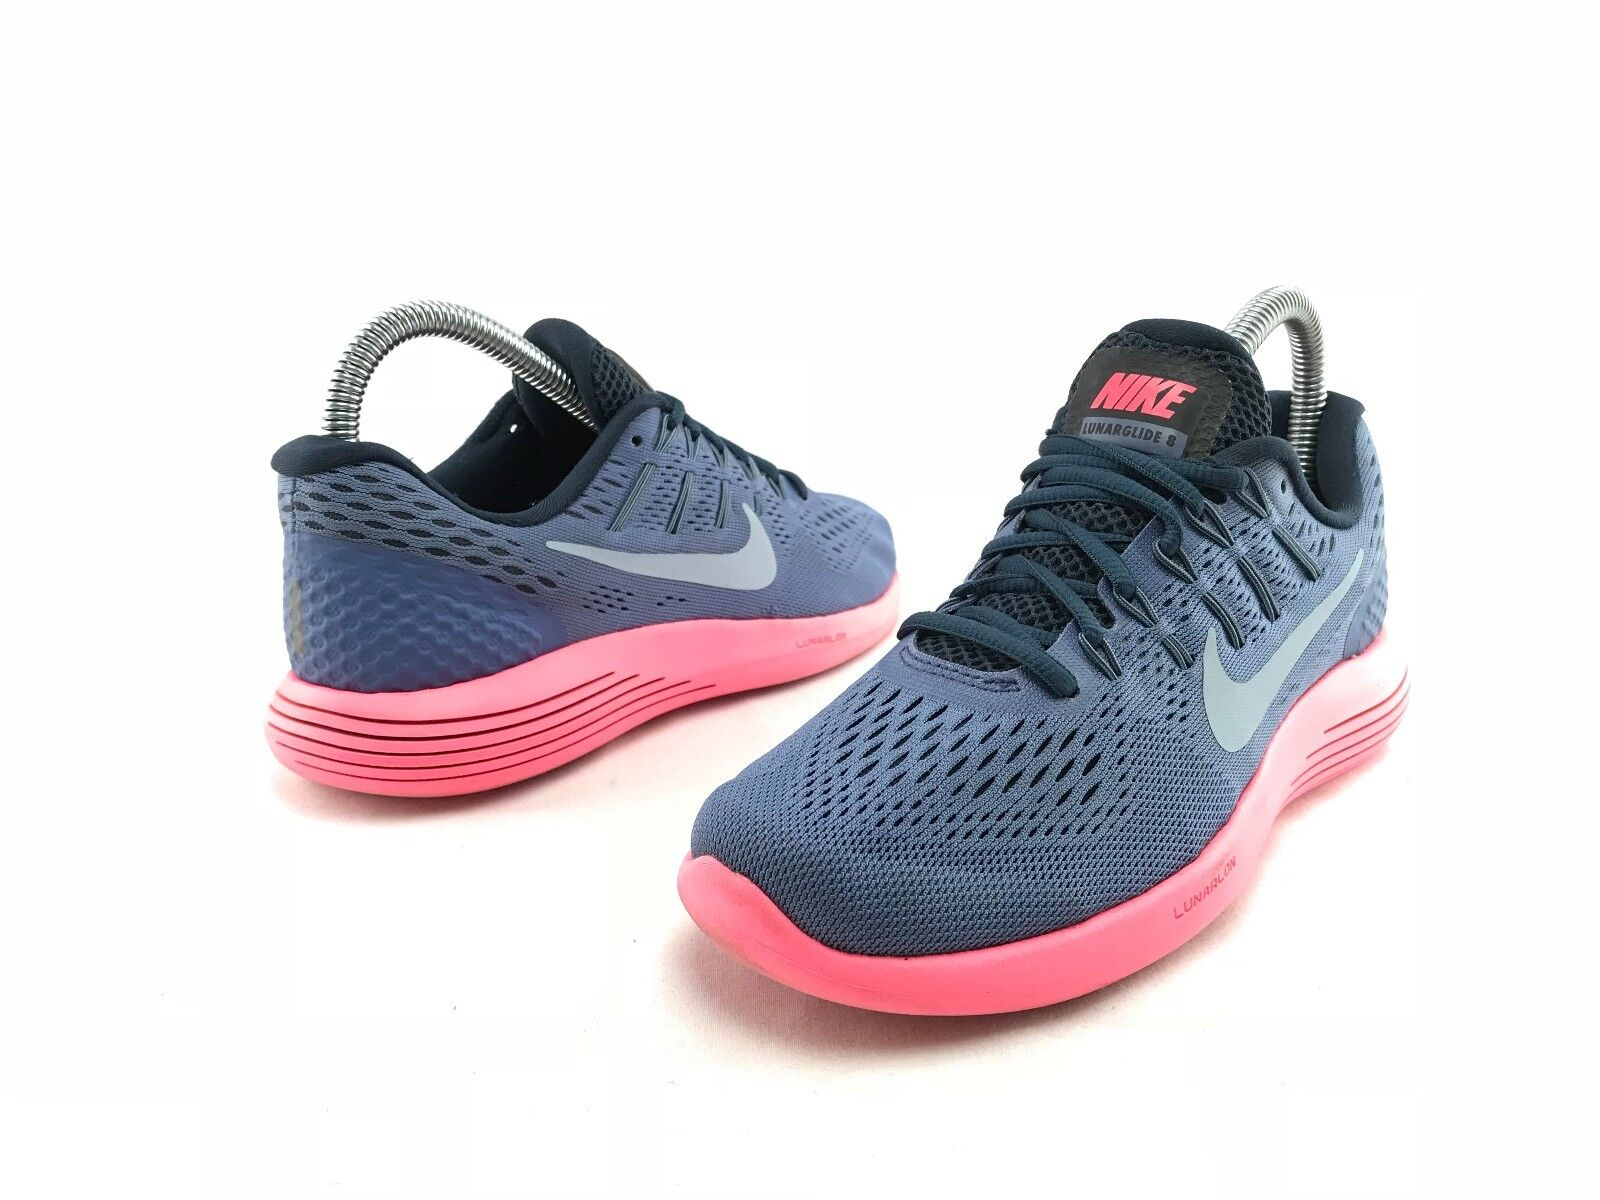 Nike Lunarglide 8 Women's Blue Pink Athletic Sport Running Shoes US 6 B645